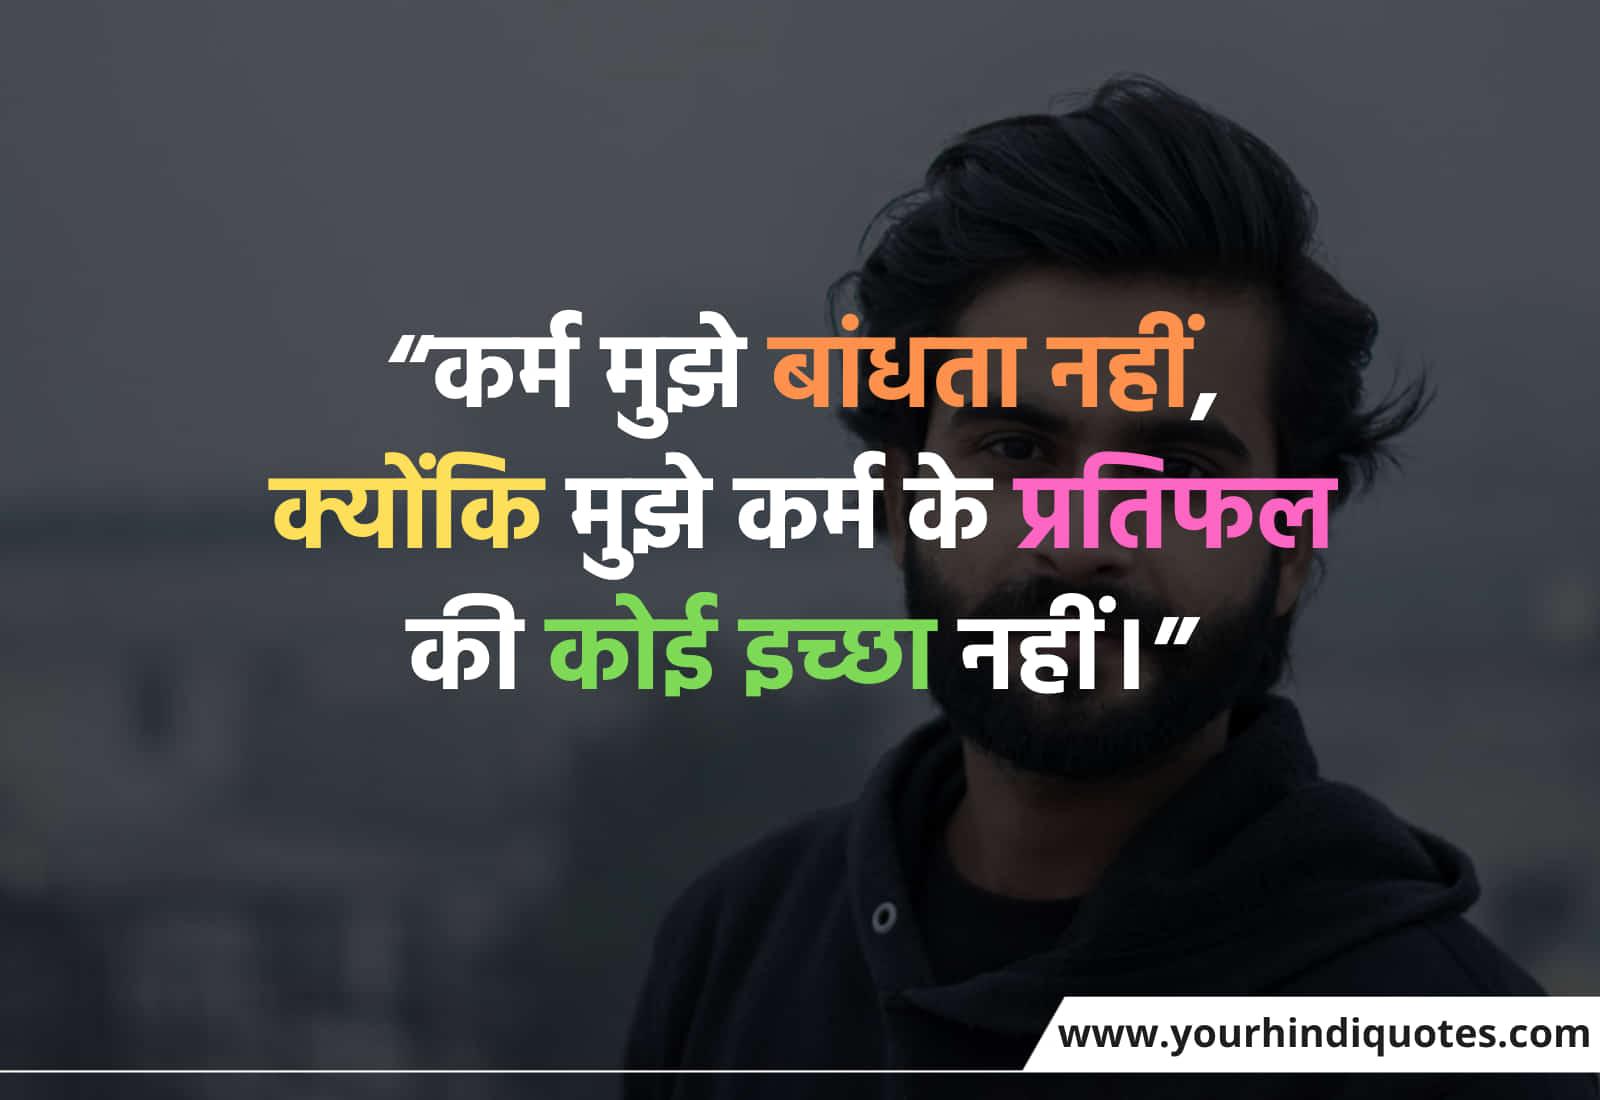 Hindi Bhagwat Gita Quotes For Life